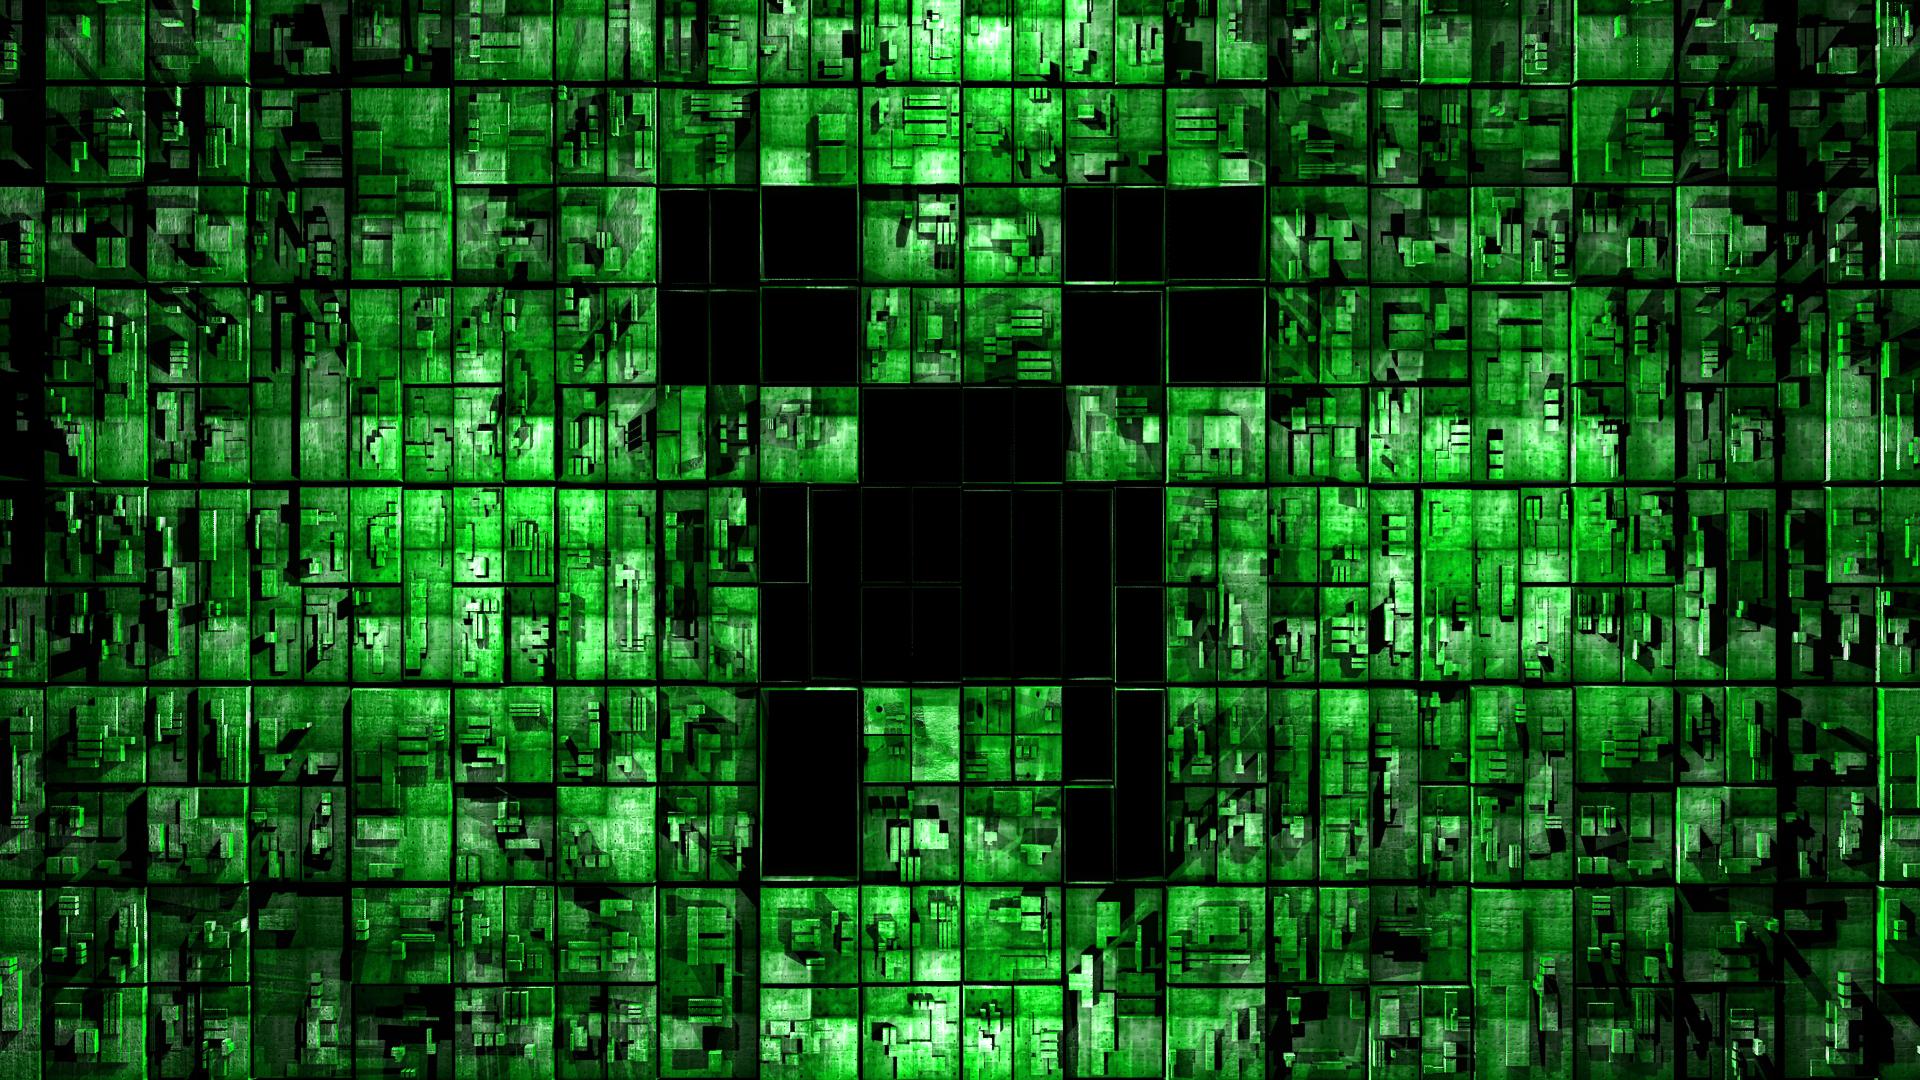 Free Download Wallpapers Minecraft Laptop Fond Ecran Hd